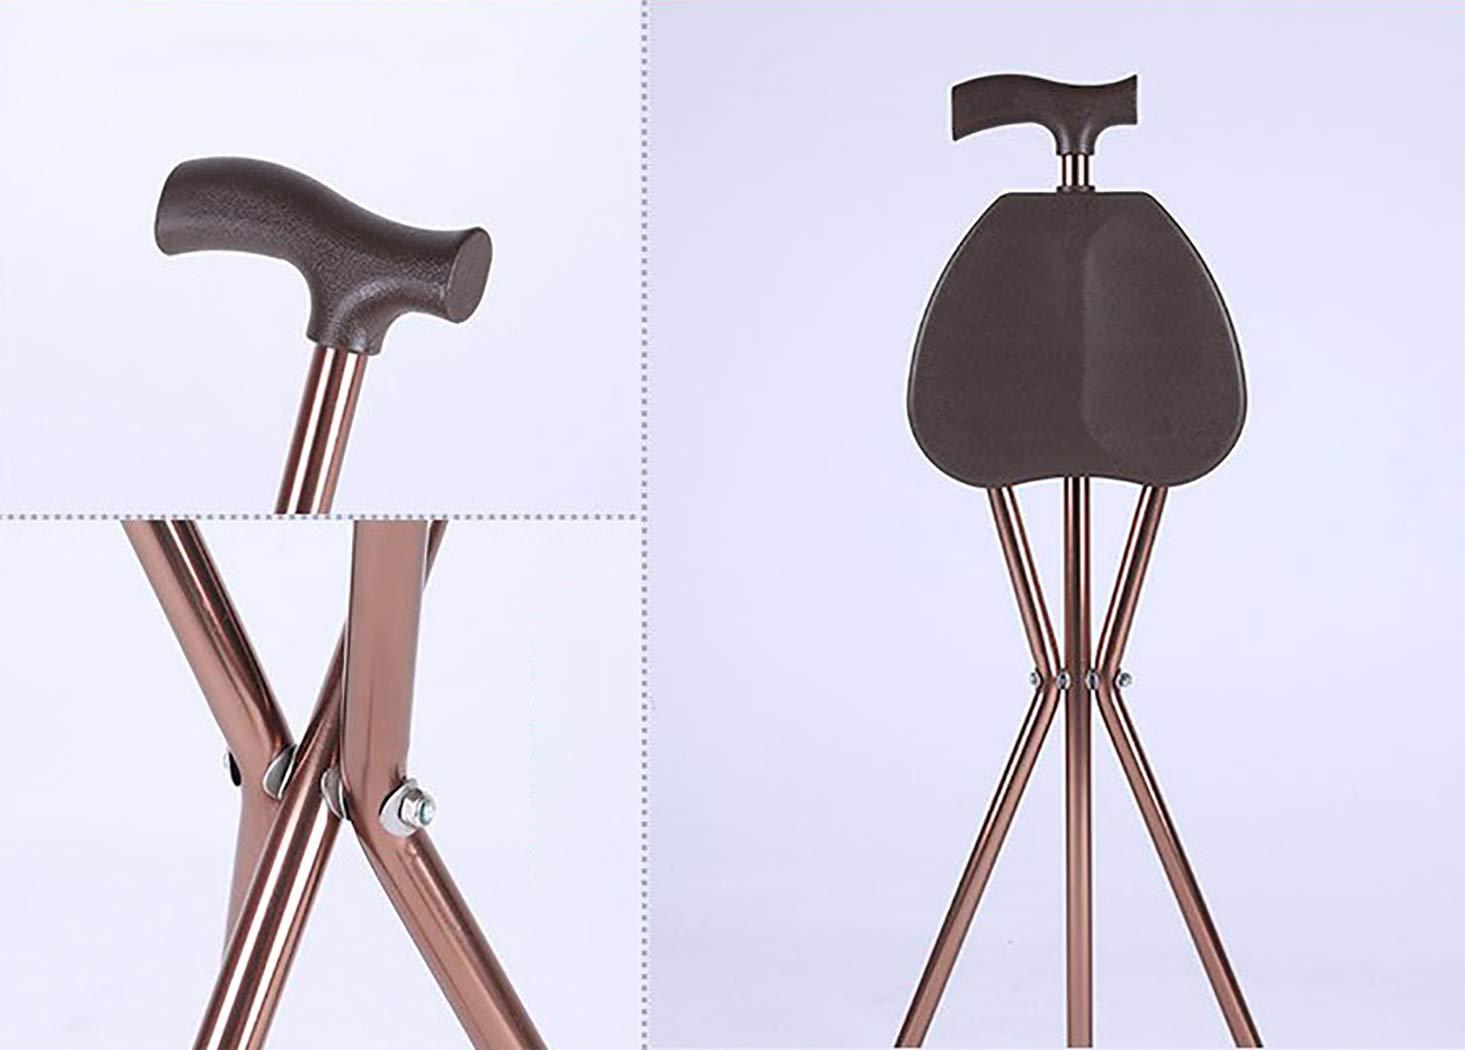 YGUOZ Baston Silla Plegable Muleta Port/átil Asiento de Bast/ón con T-Mango Bast/ón Ligero Aluminio para Padres Madres Regalos